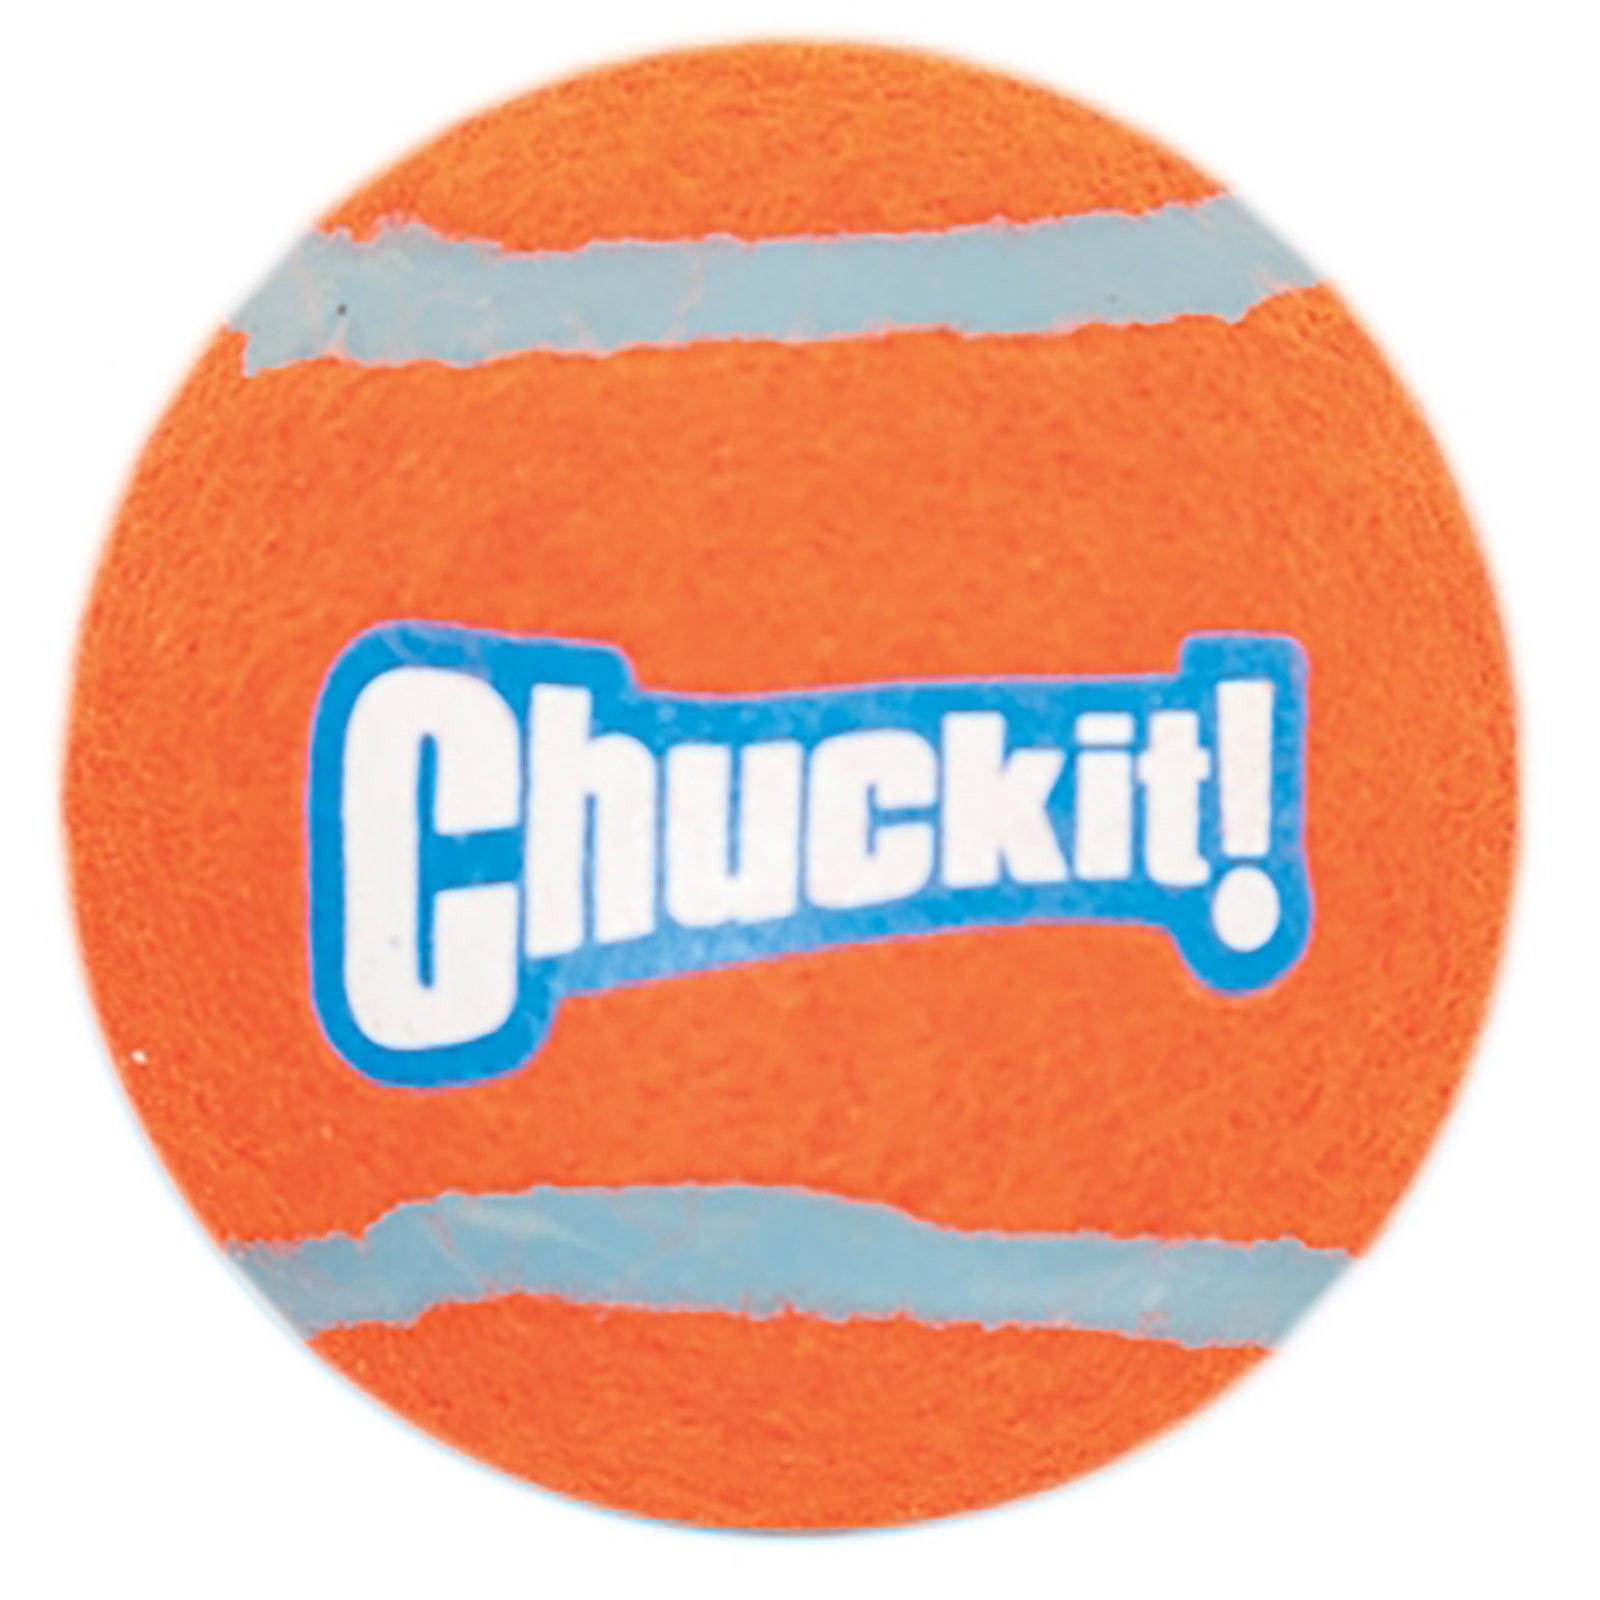 Chuckit! Dog Tennis Balls Medium - £2.89 (+£4.49 Non-Prime) @ Amazon